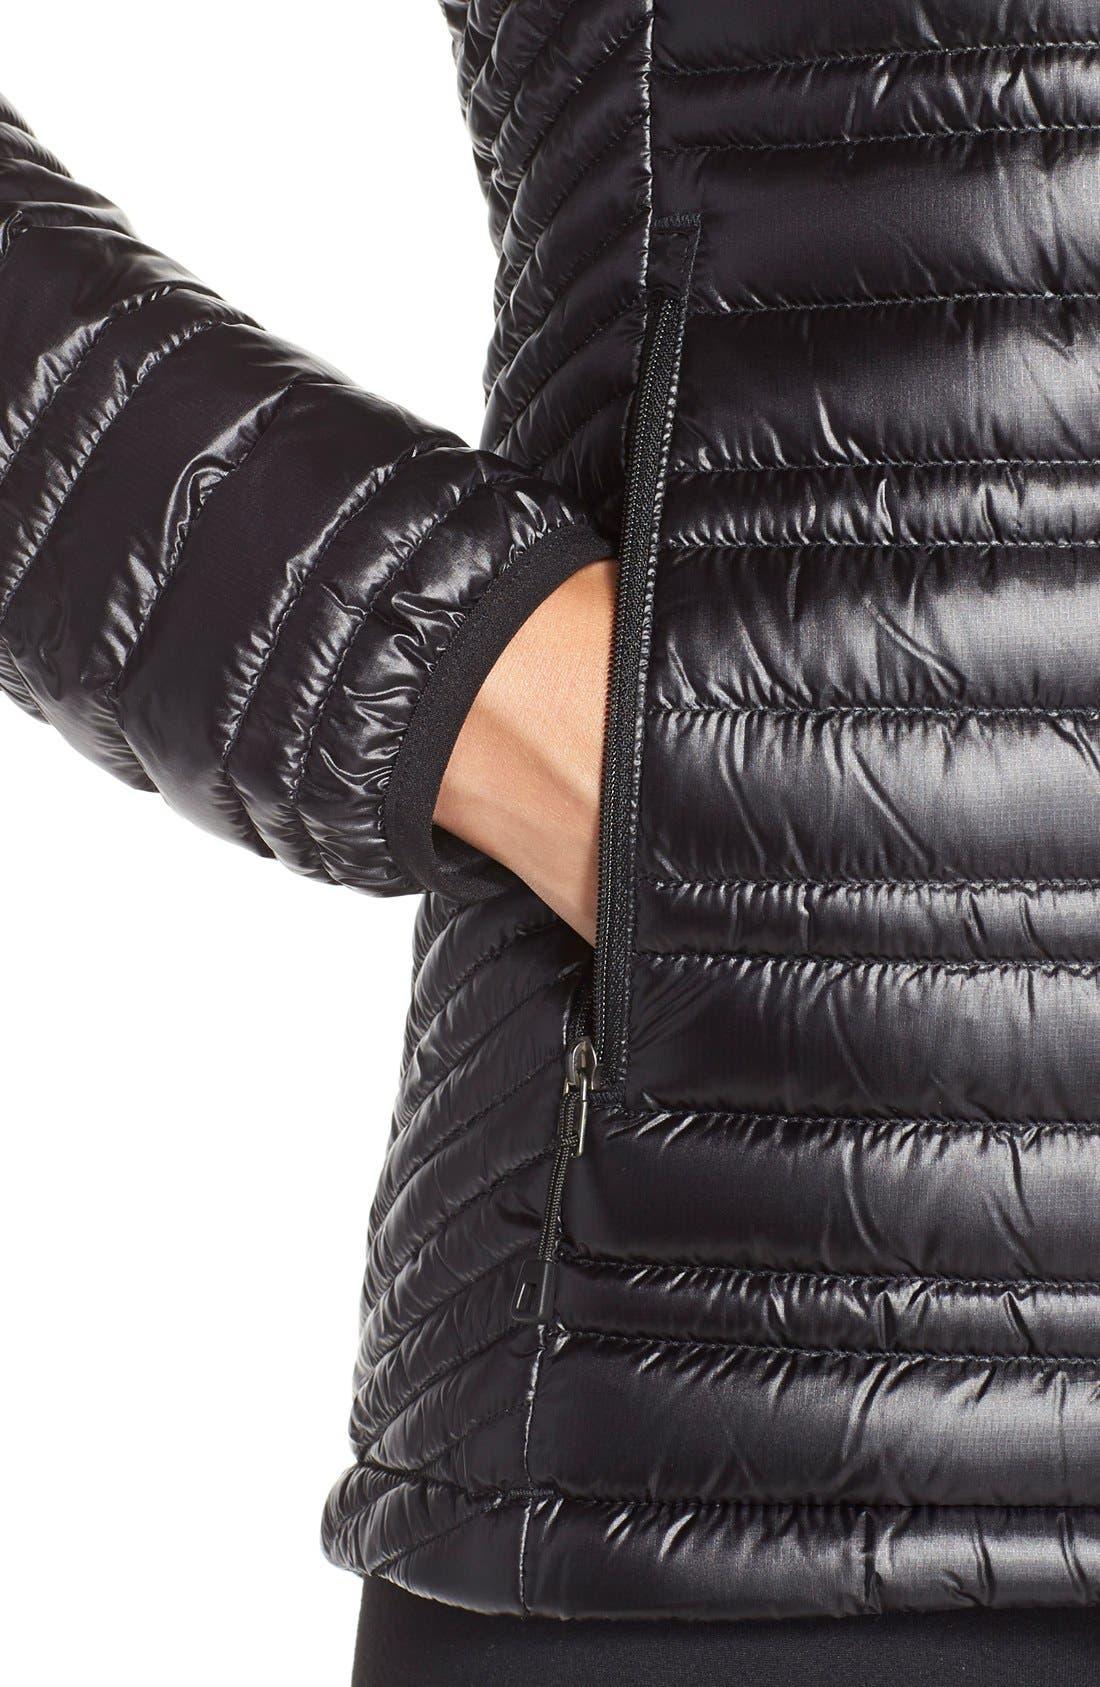 PATAGONIA,                             'Ultralight' Down Puffer Jacket,                             Alternate thumbnail 4, color,                             BLACK